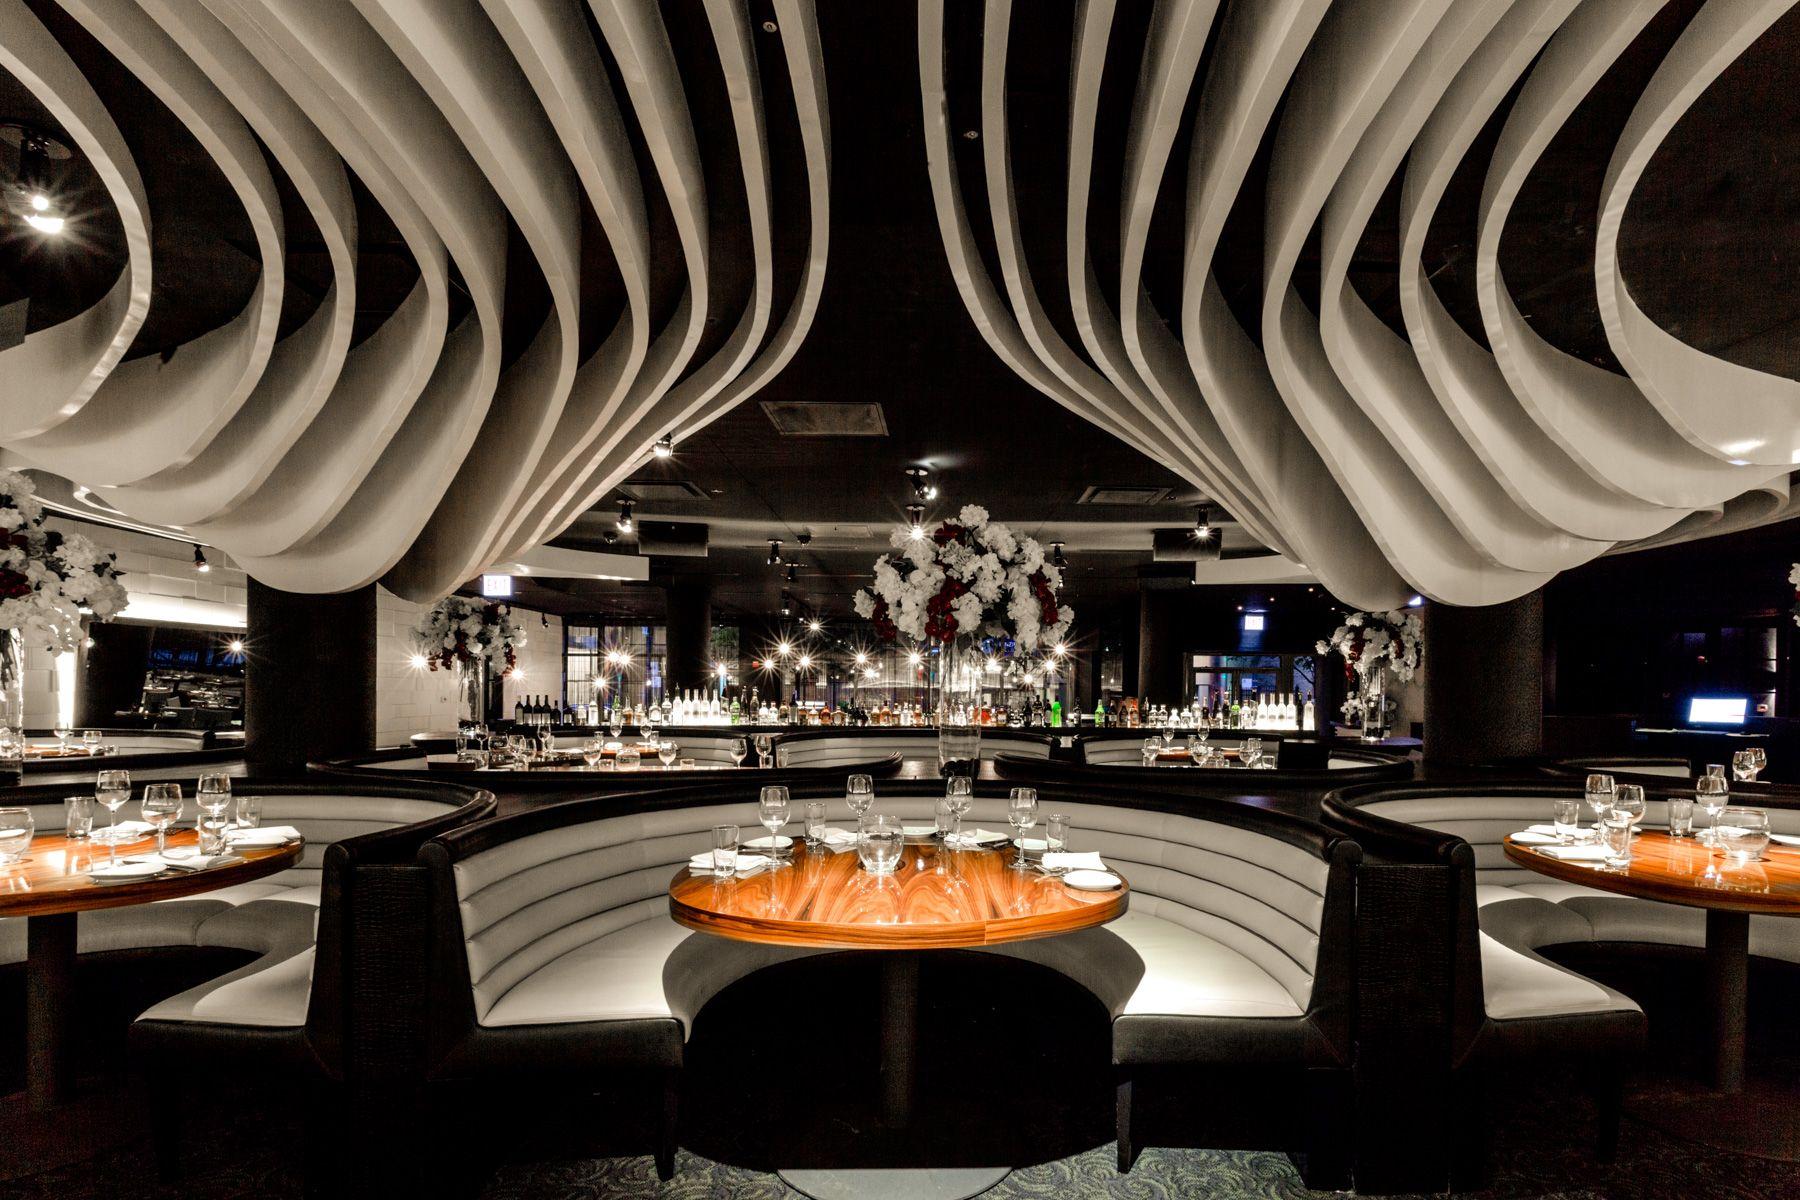 A Taste Of Stk Across The Country  Best Steak Restaurants Prepossessing Stk Private Dining Room Review